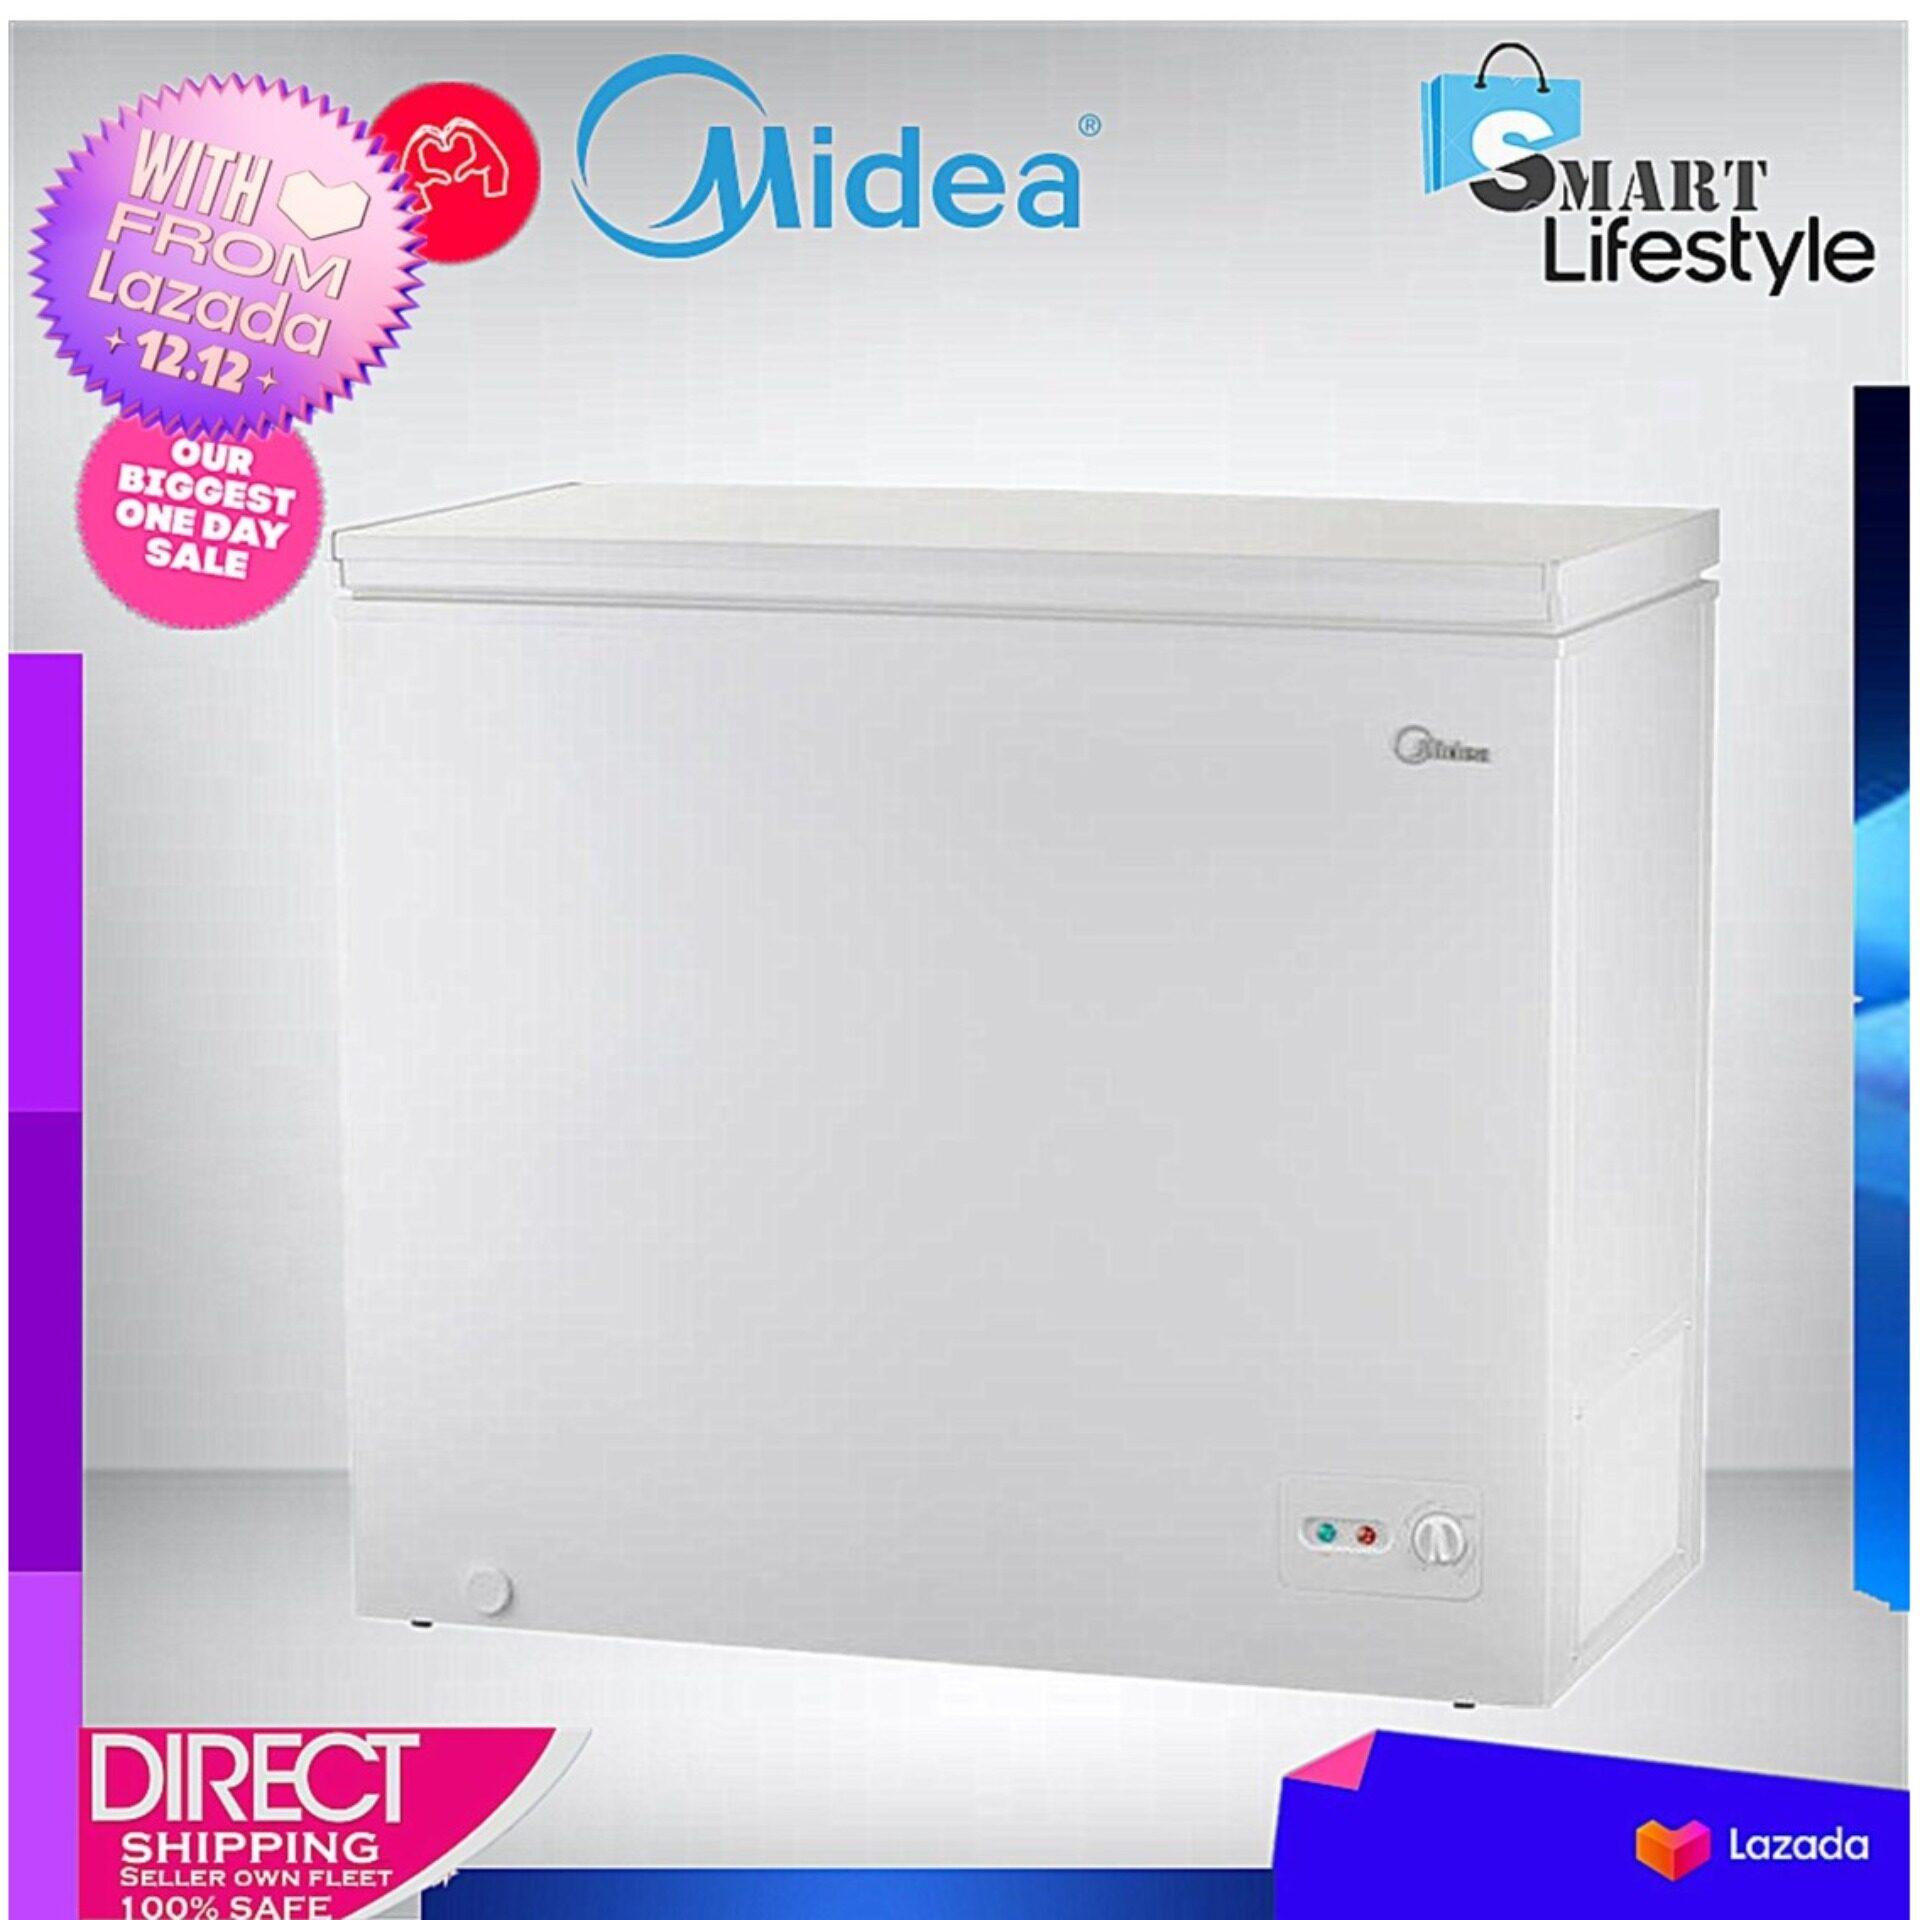 [12.12] Midea 258L Chest Freezer WD-258W